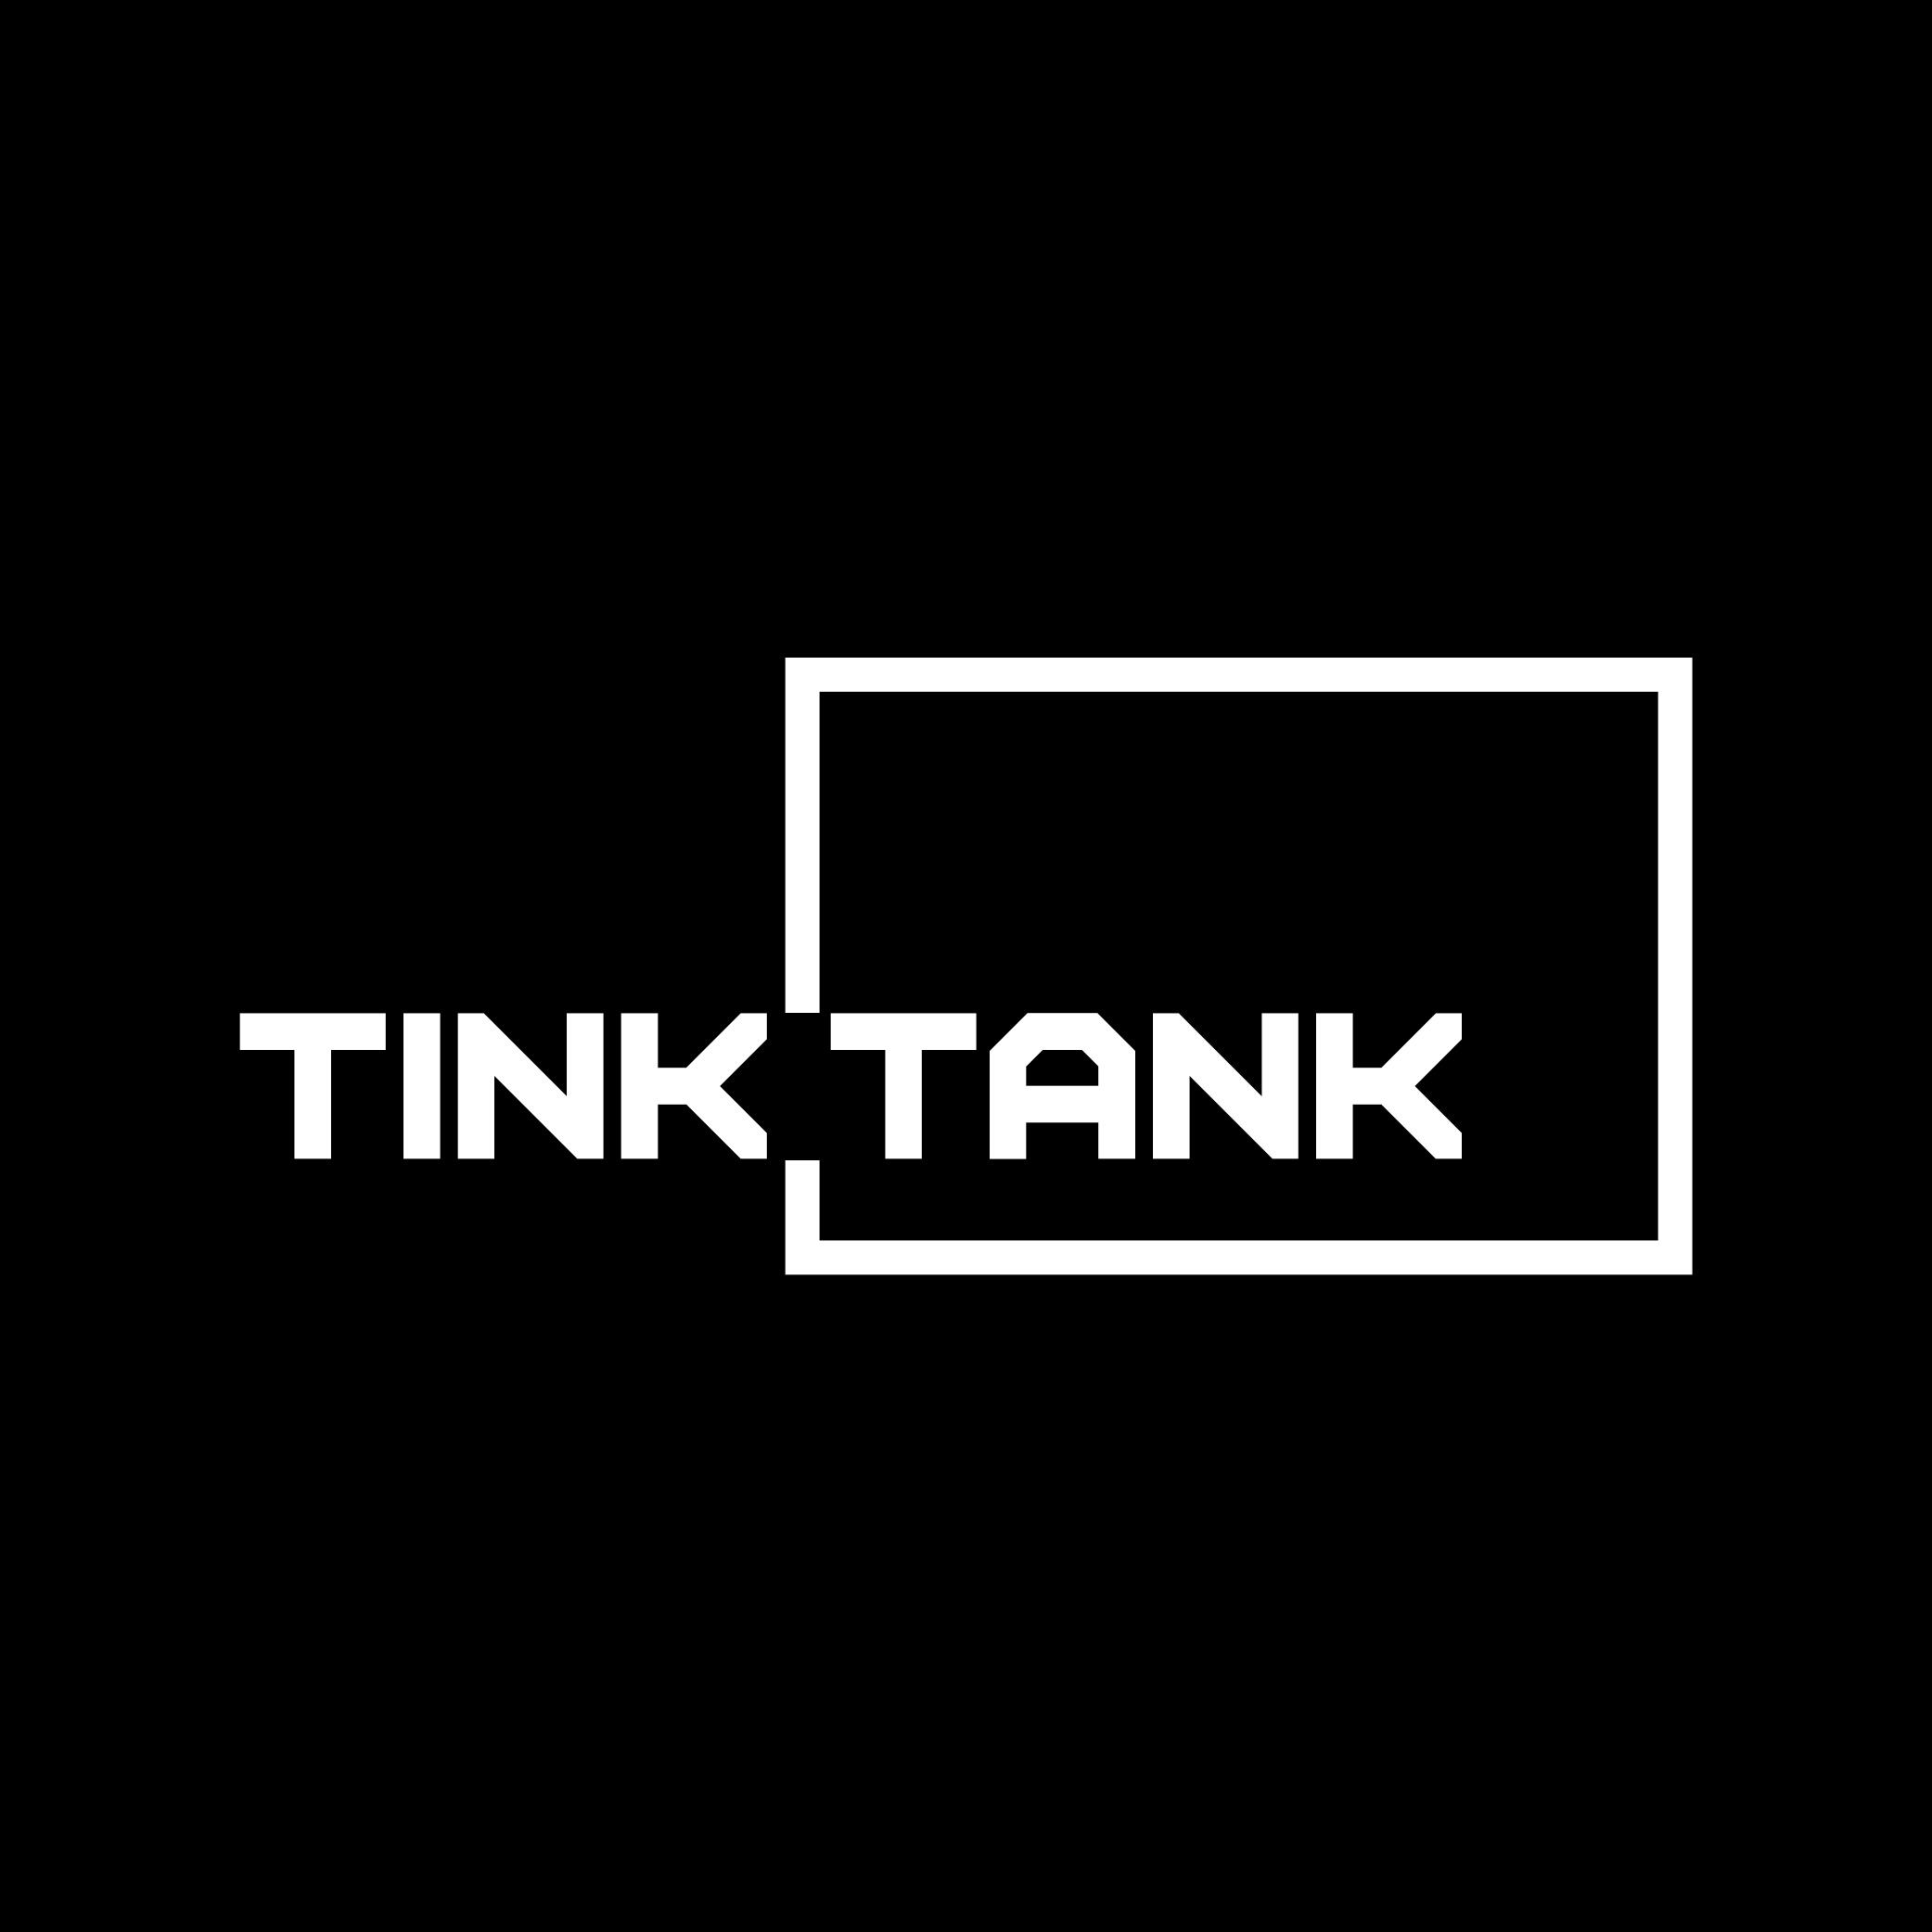 Logo Tink Tank Space